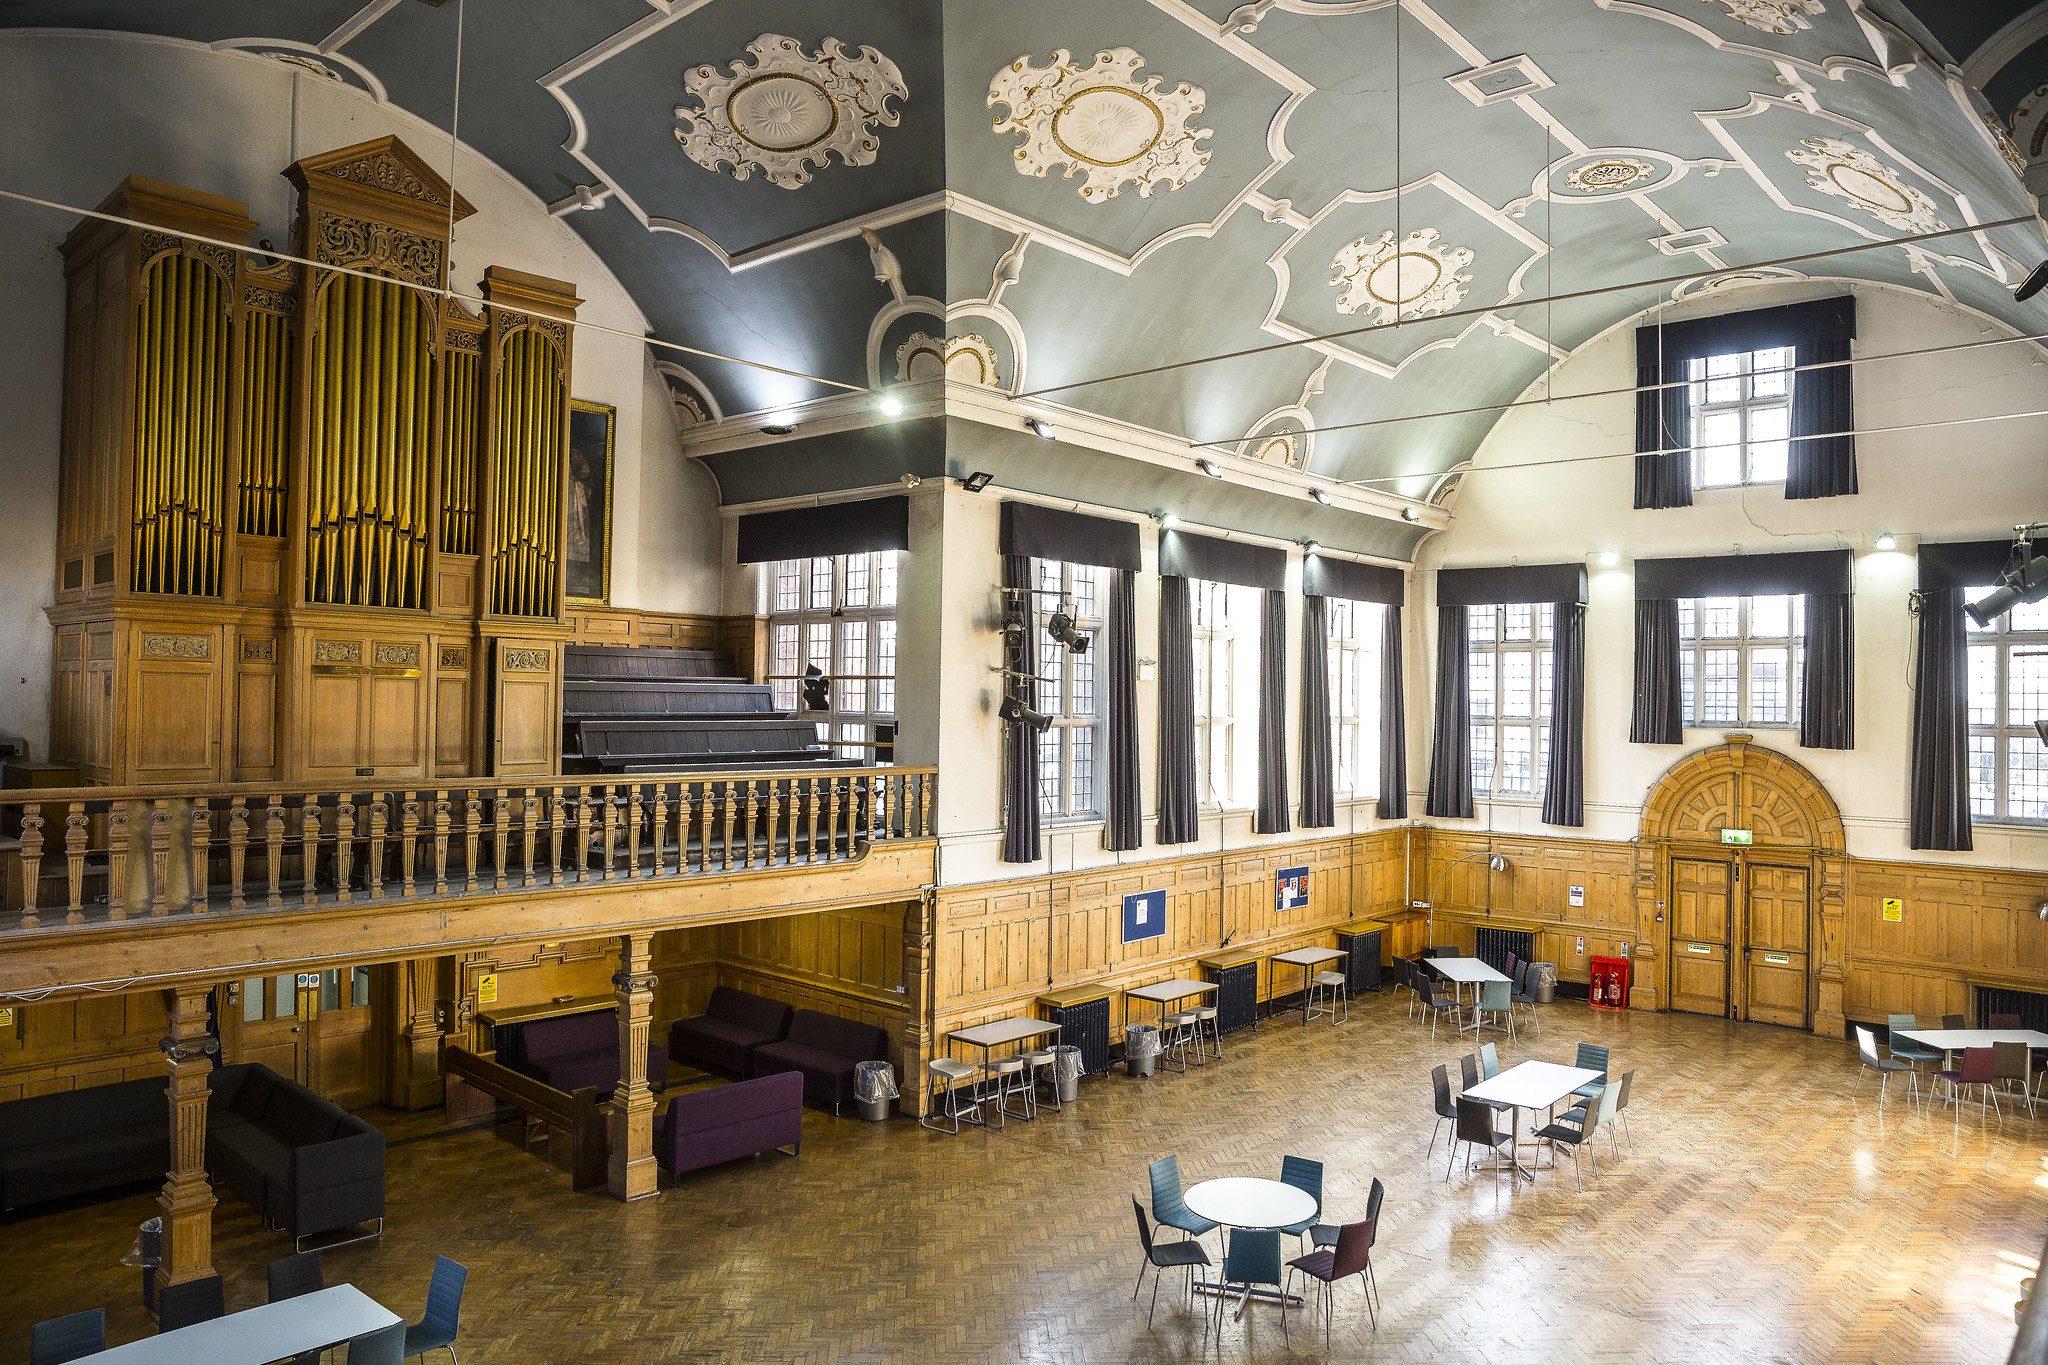 The Grand Hall 2019 4